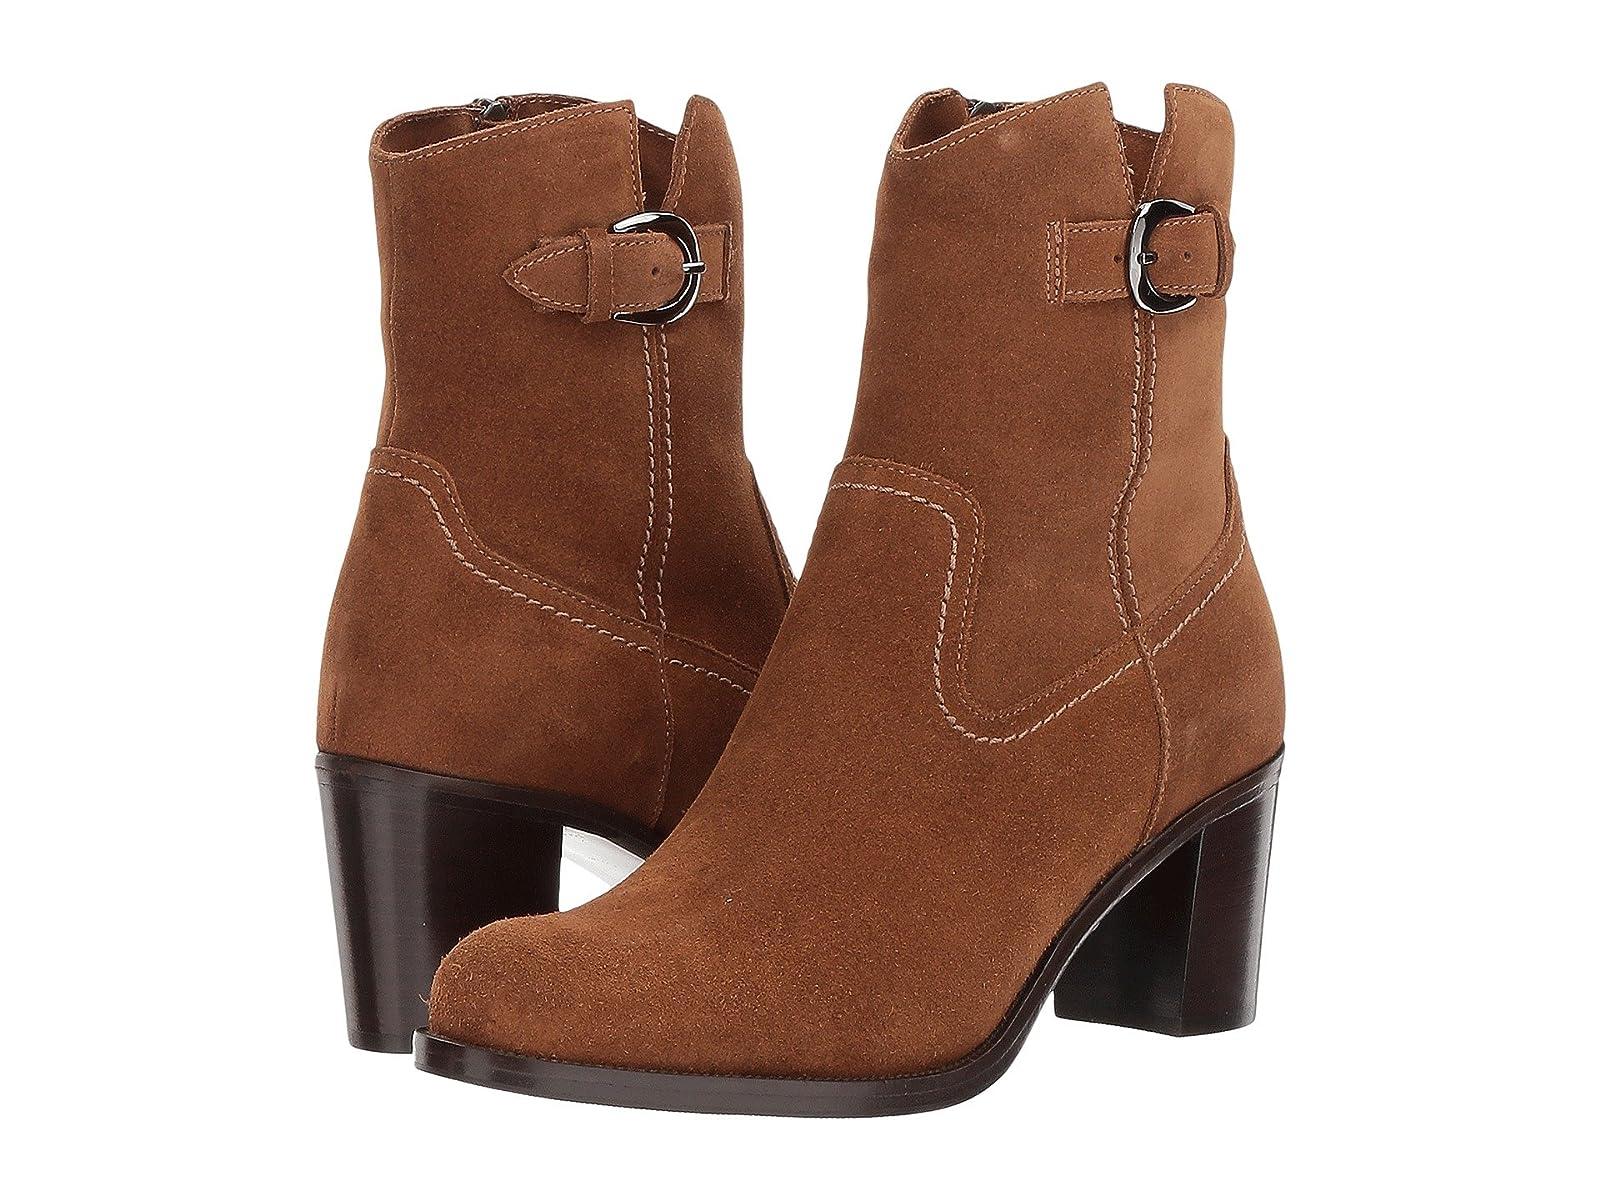 La Canadienne PattieCheap and distinctive eye-catching shoes